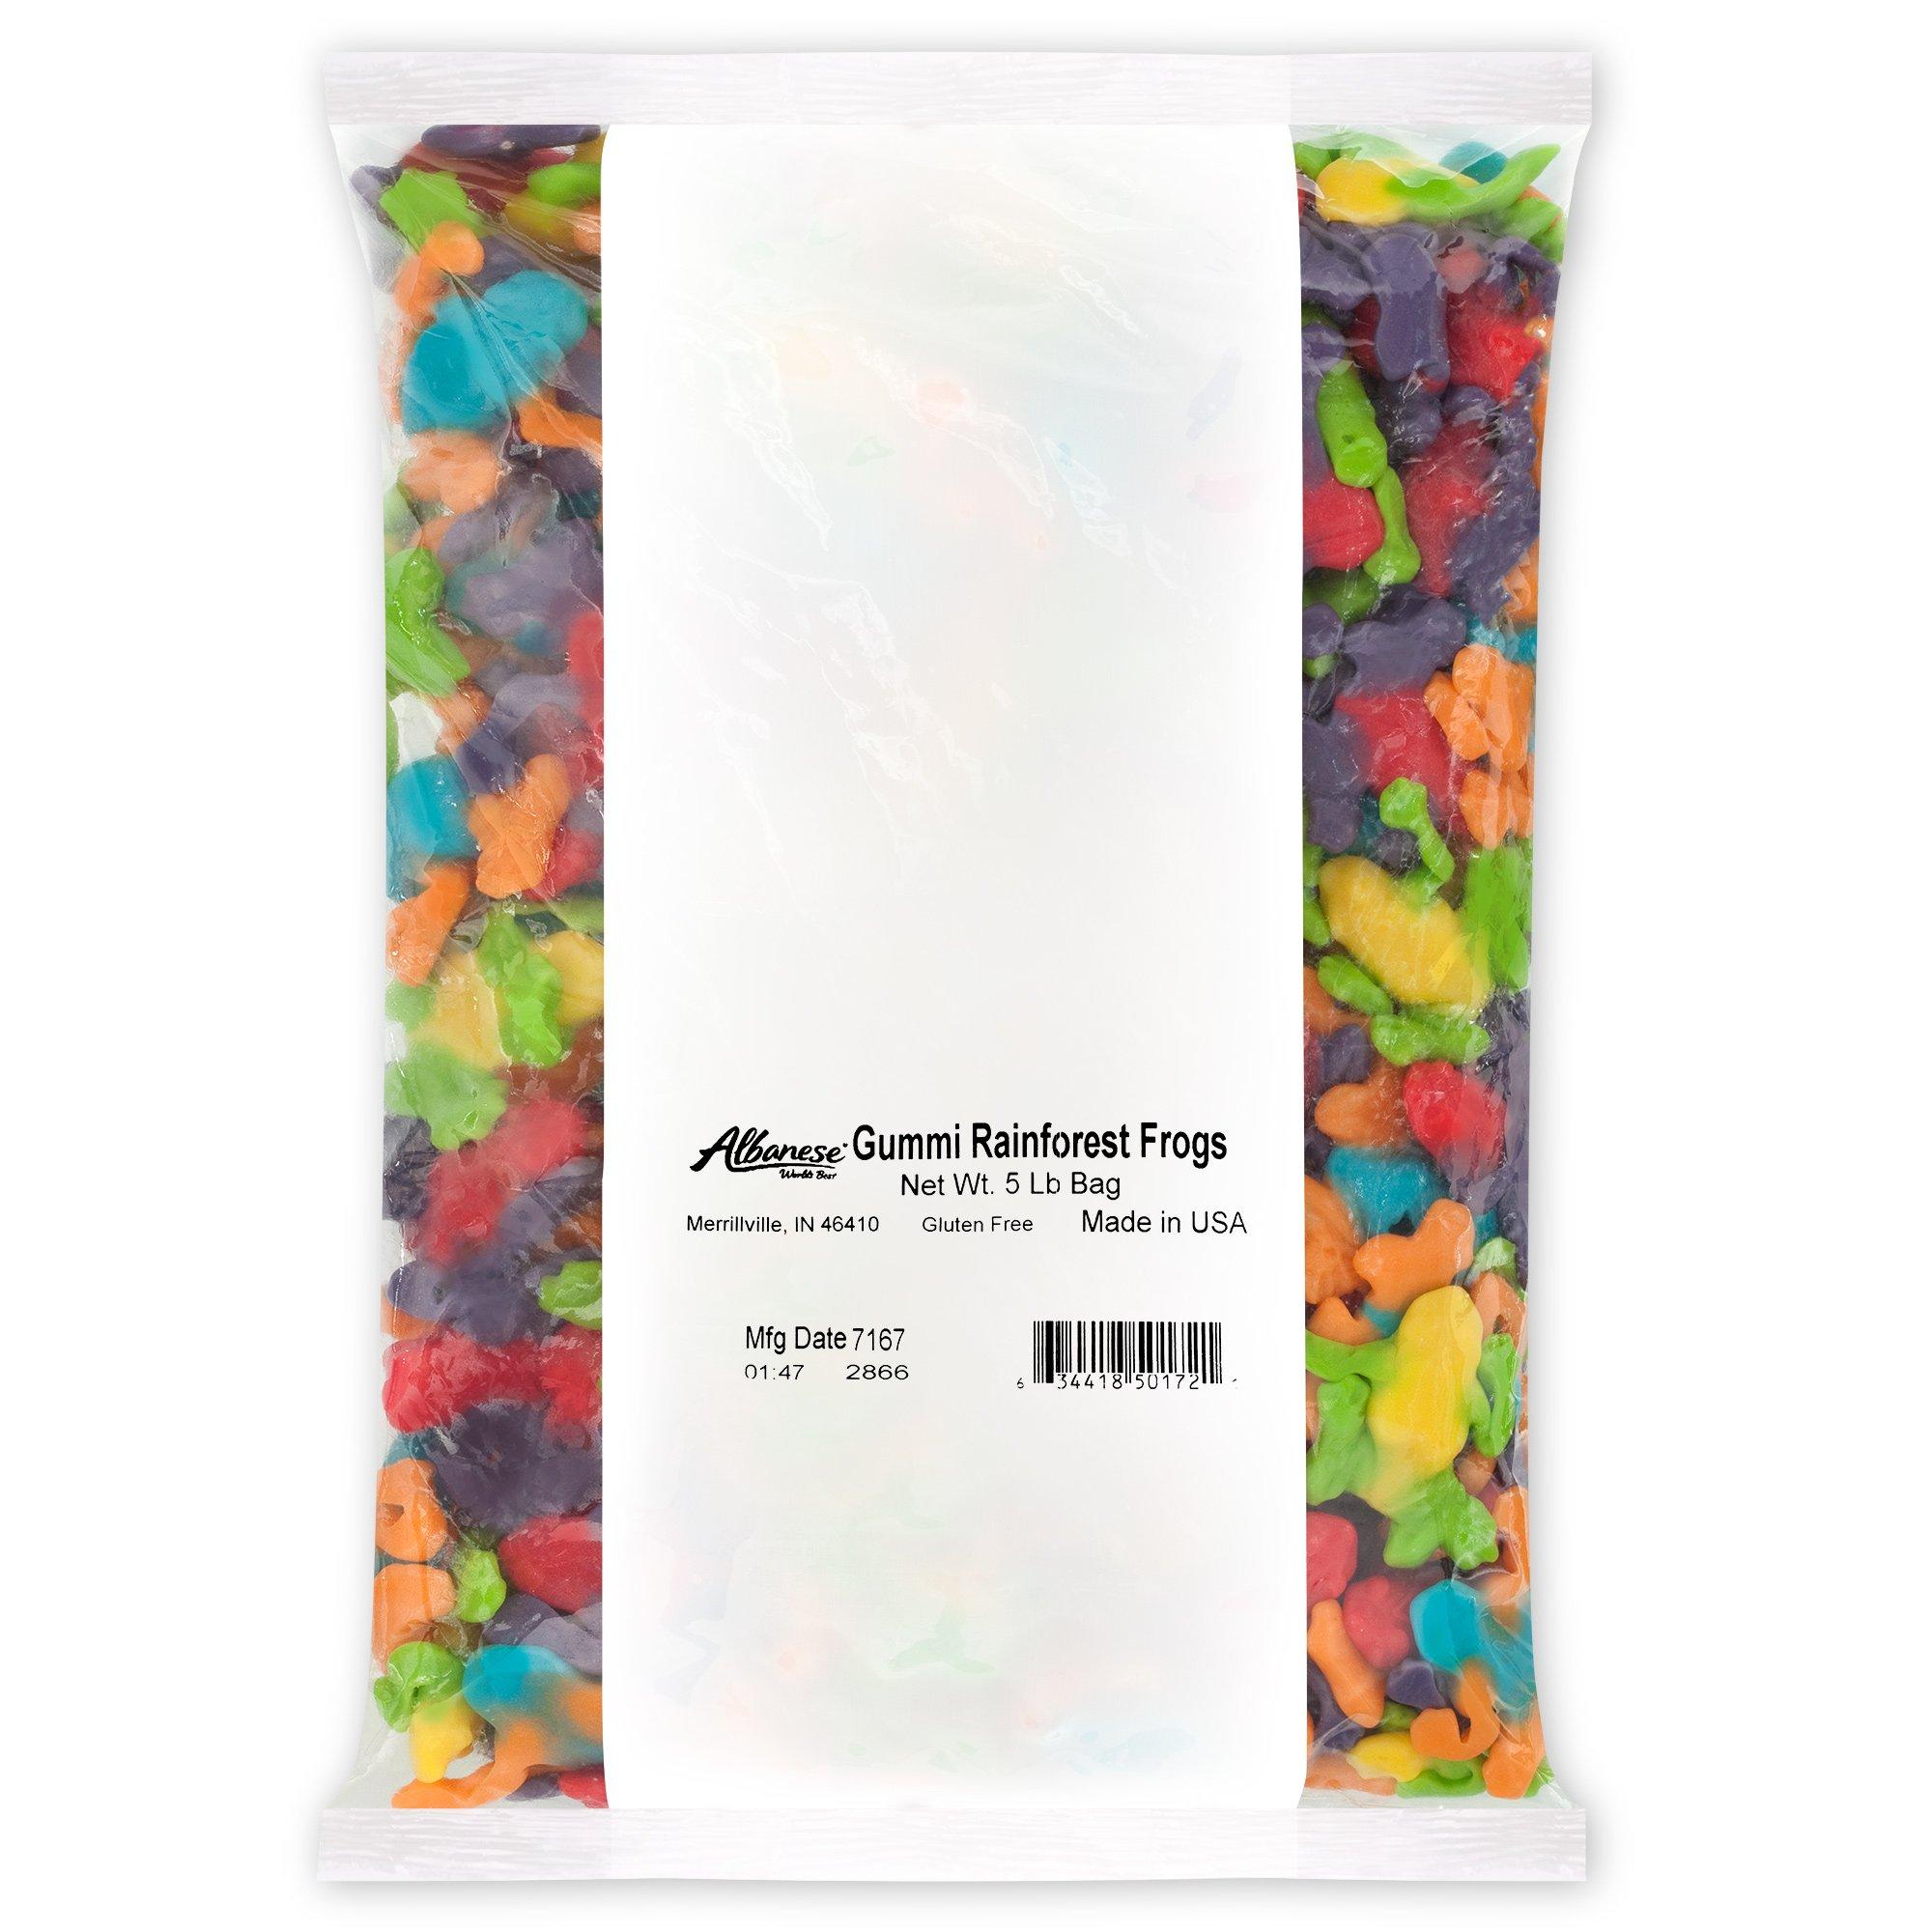 Albanese Candy Gummi Rainforest Frogs, 5 Pound Bag, Assorted Gummi Frogs: Blue Raspberry & Orange, Strawberry & Grape, Sour Lemon & Sour Green Apple; Gluten Free Dairy Free Fat Free